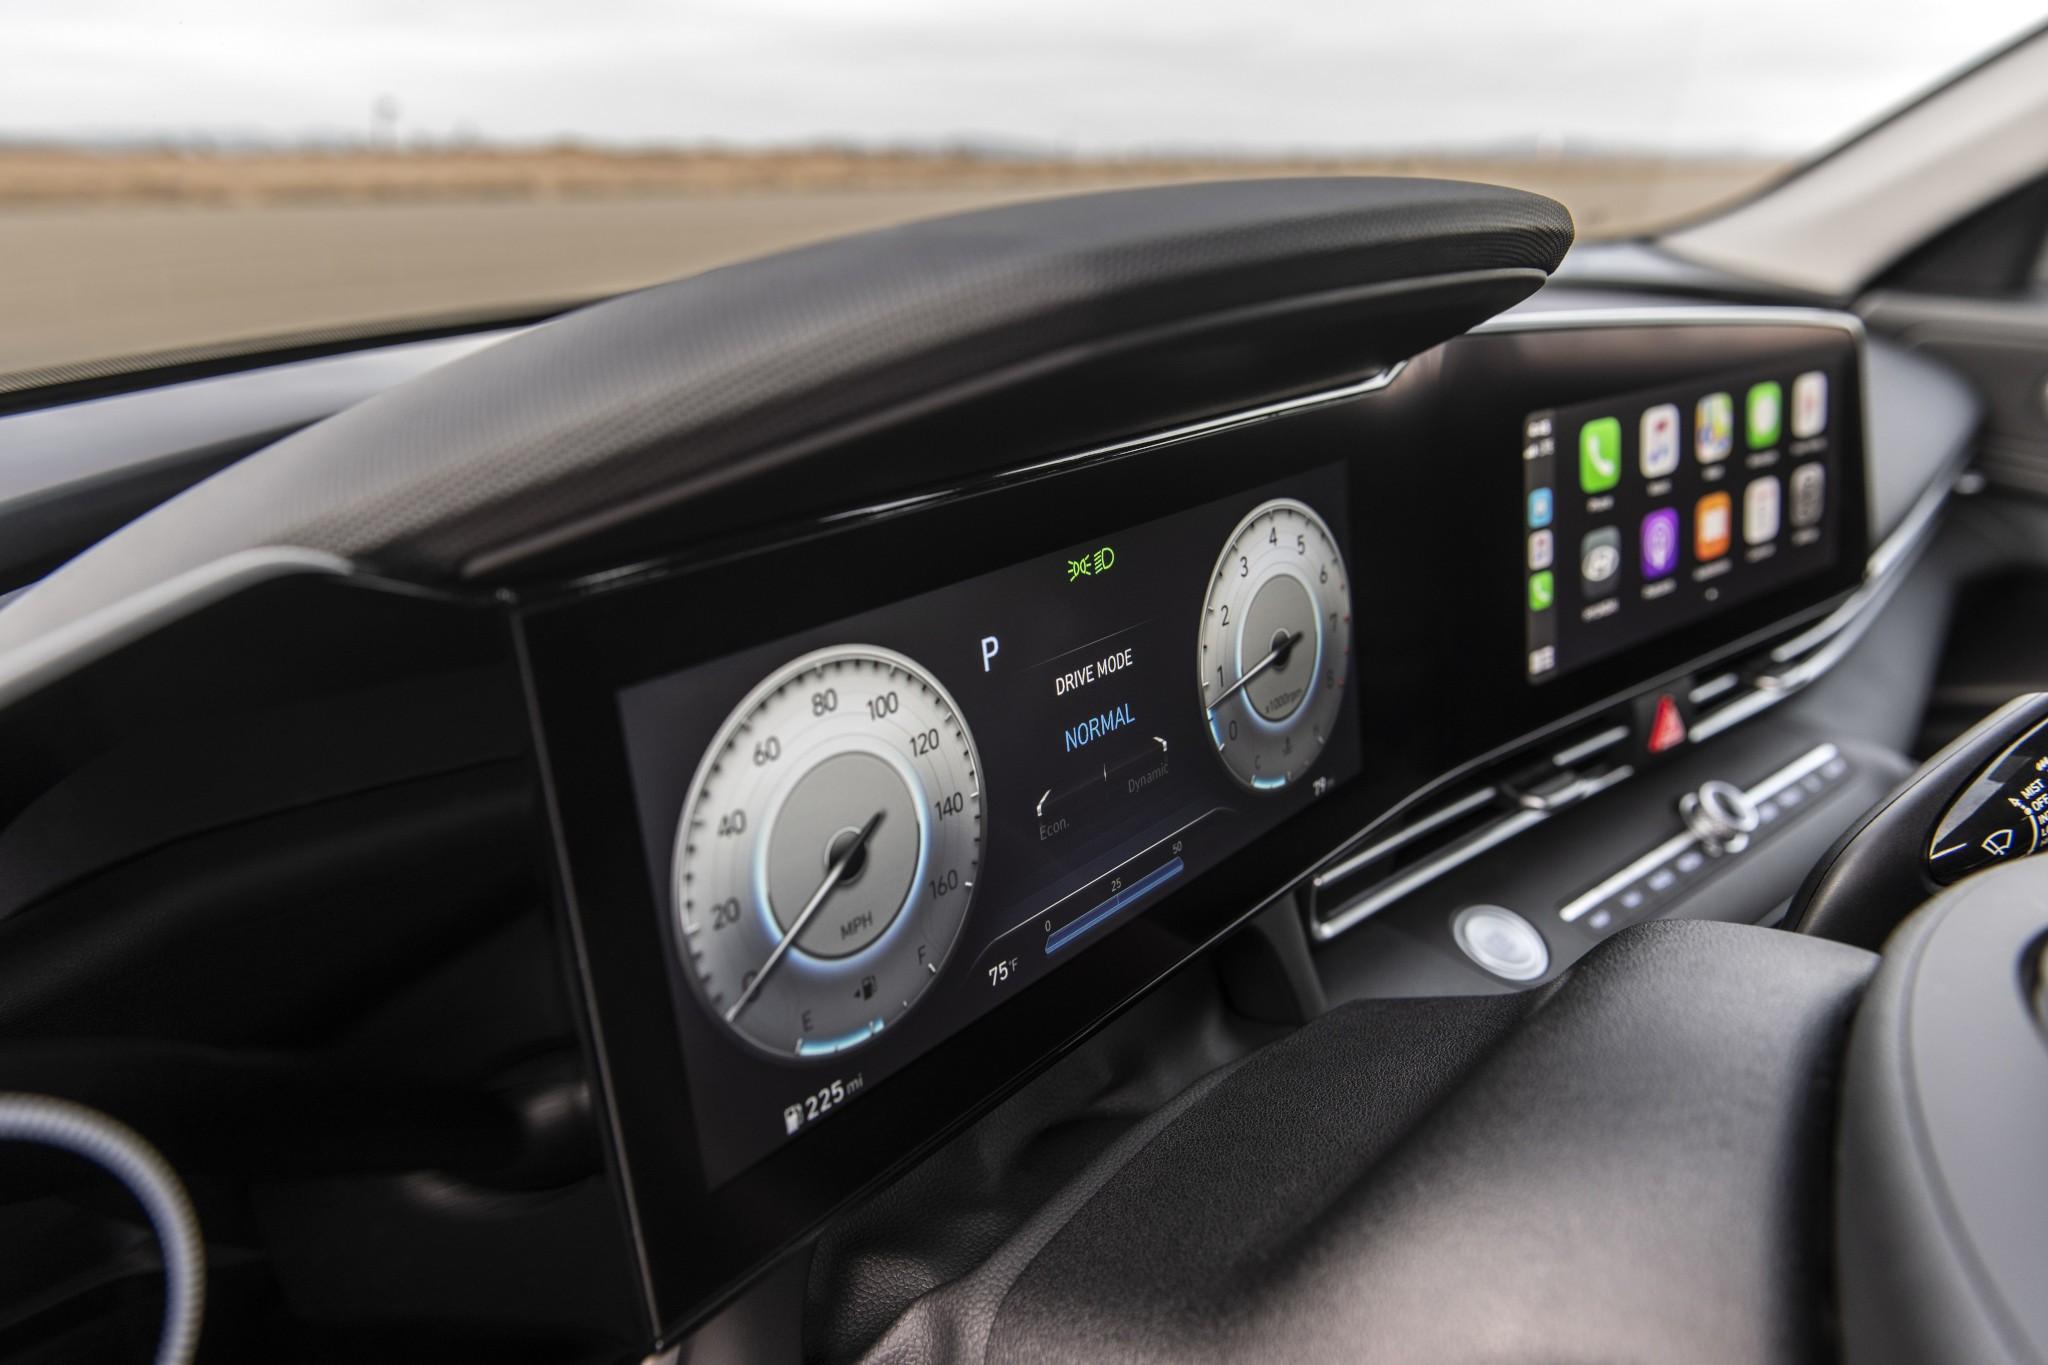 hyundai-elantra-2021-09-front-row--instrument-panel--interior.jpg